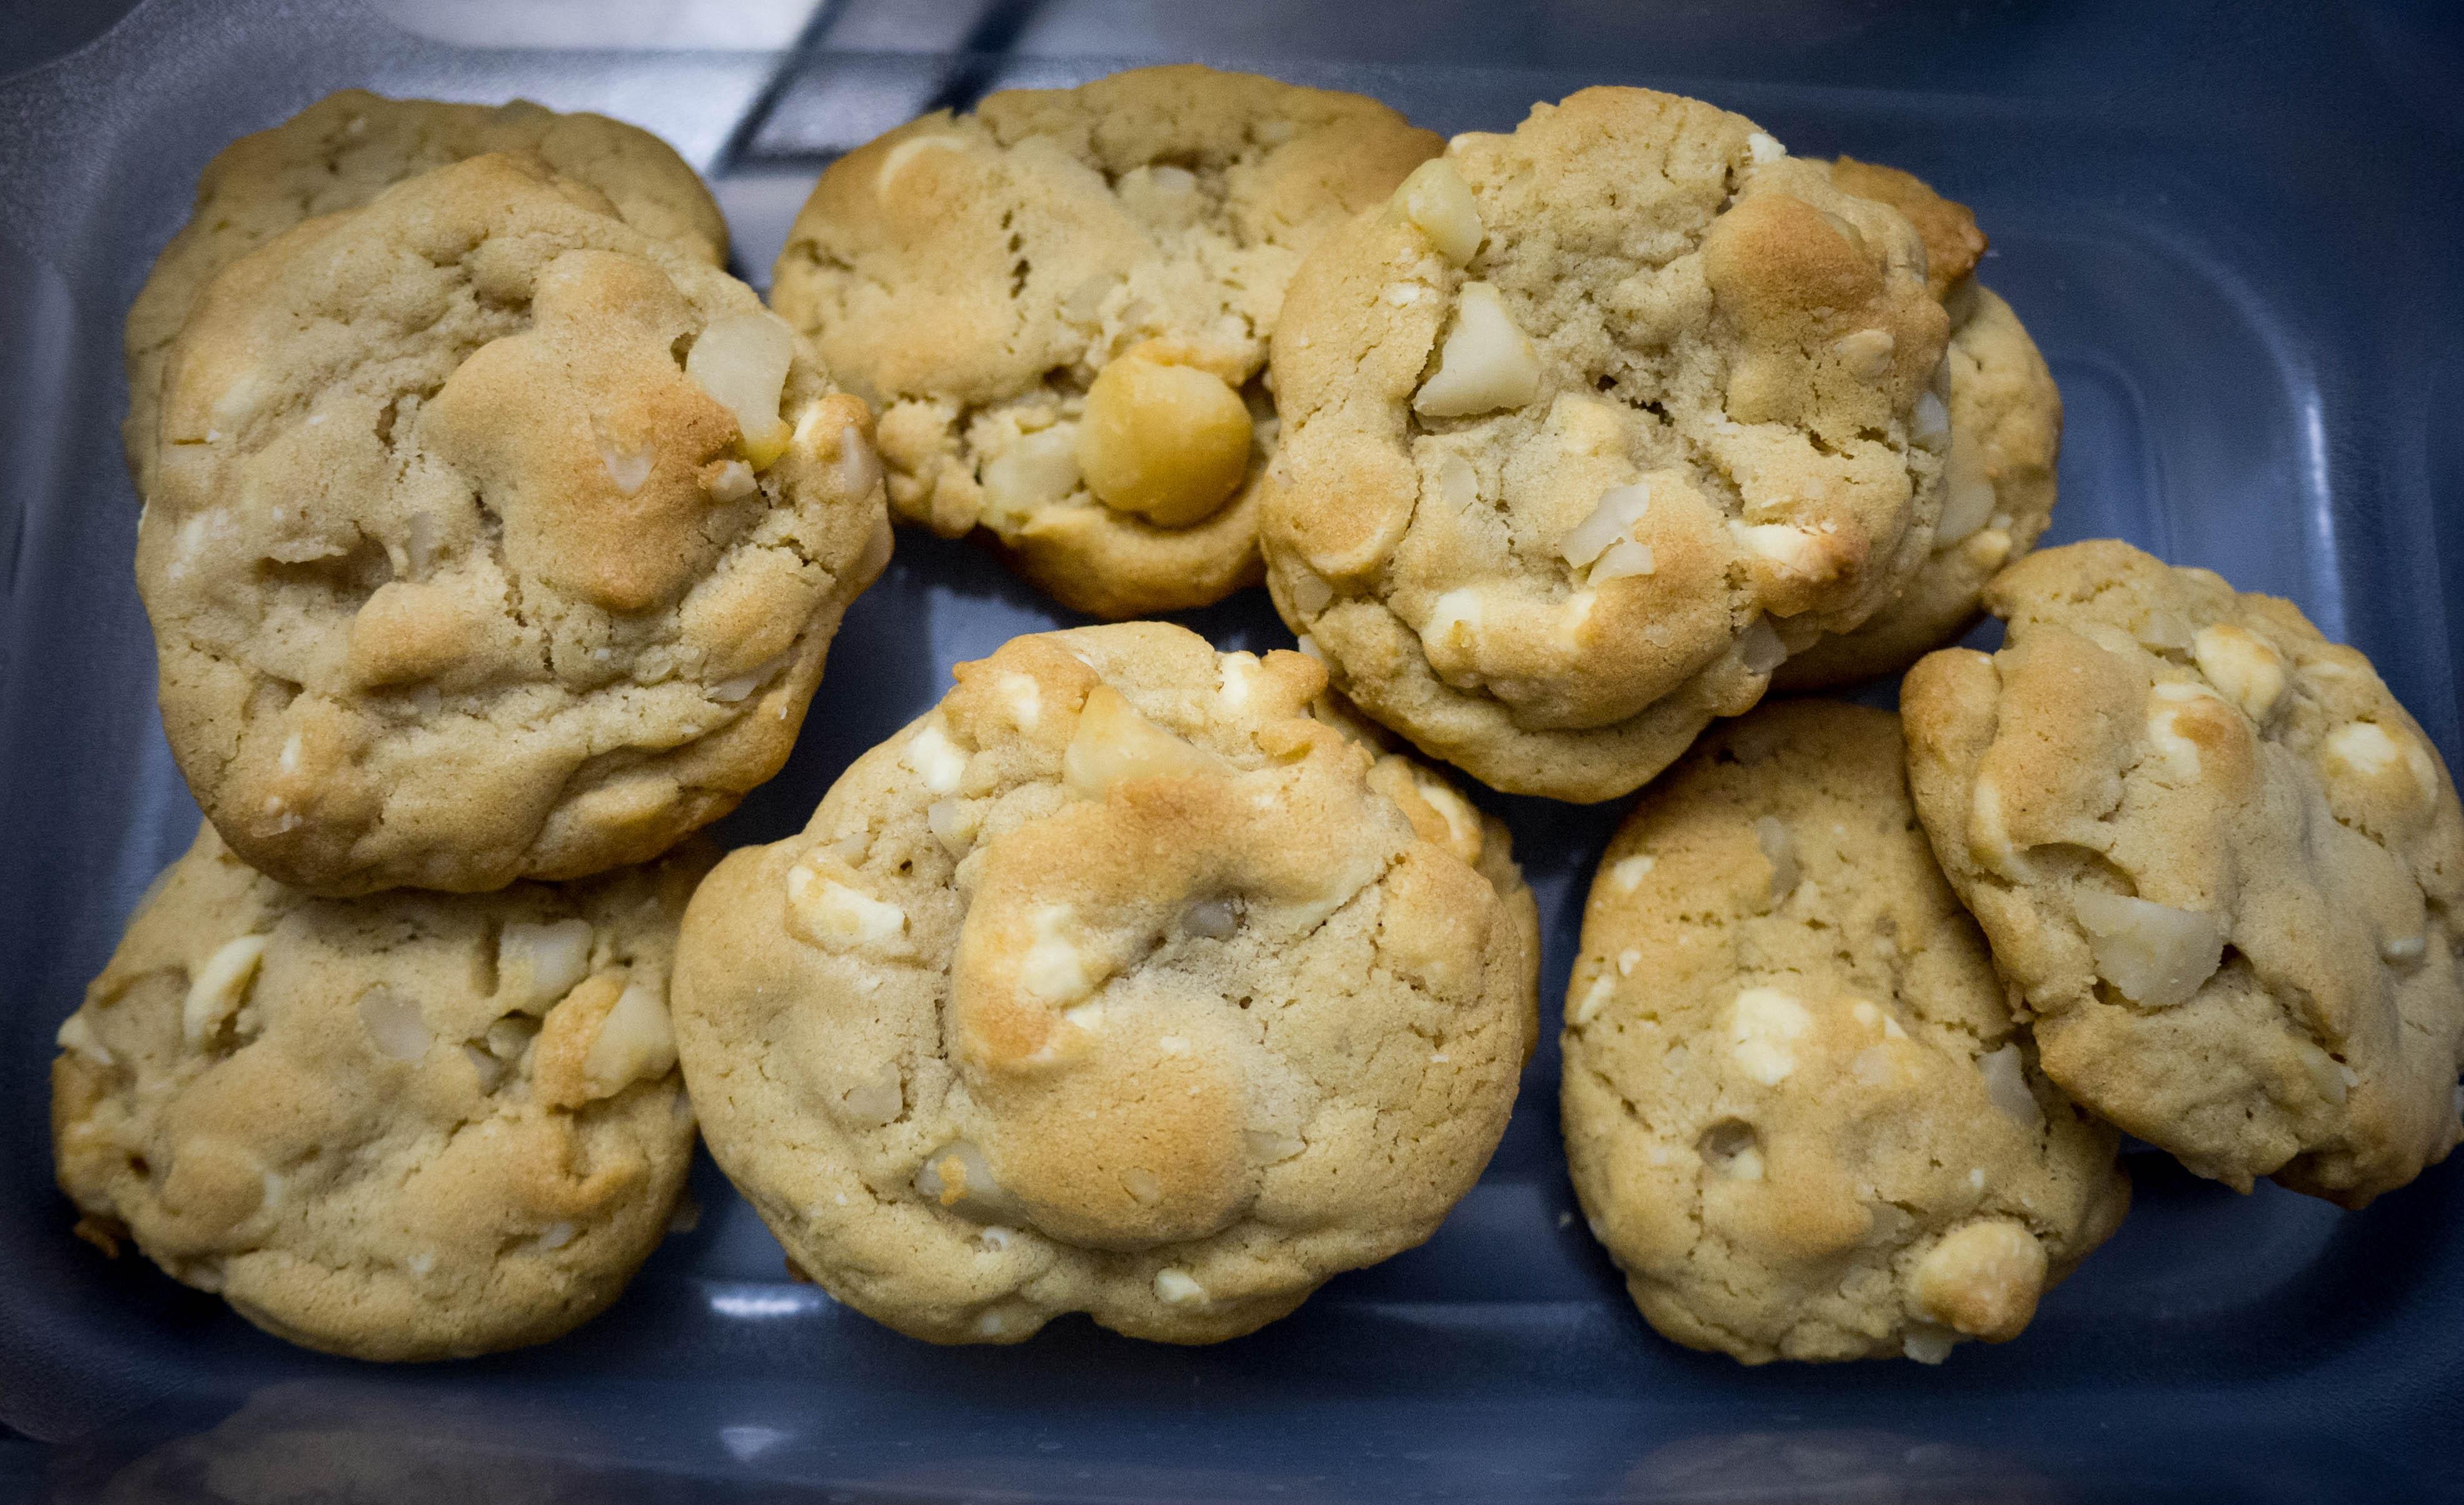 Baking] White chocolate macadamia nut cookies | Jinxi Eats